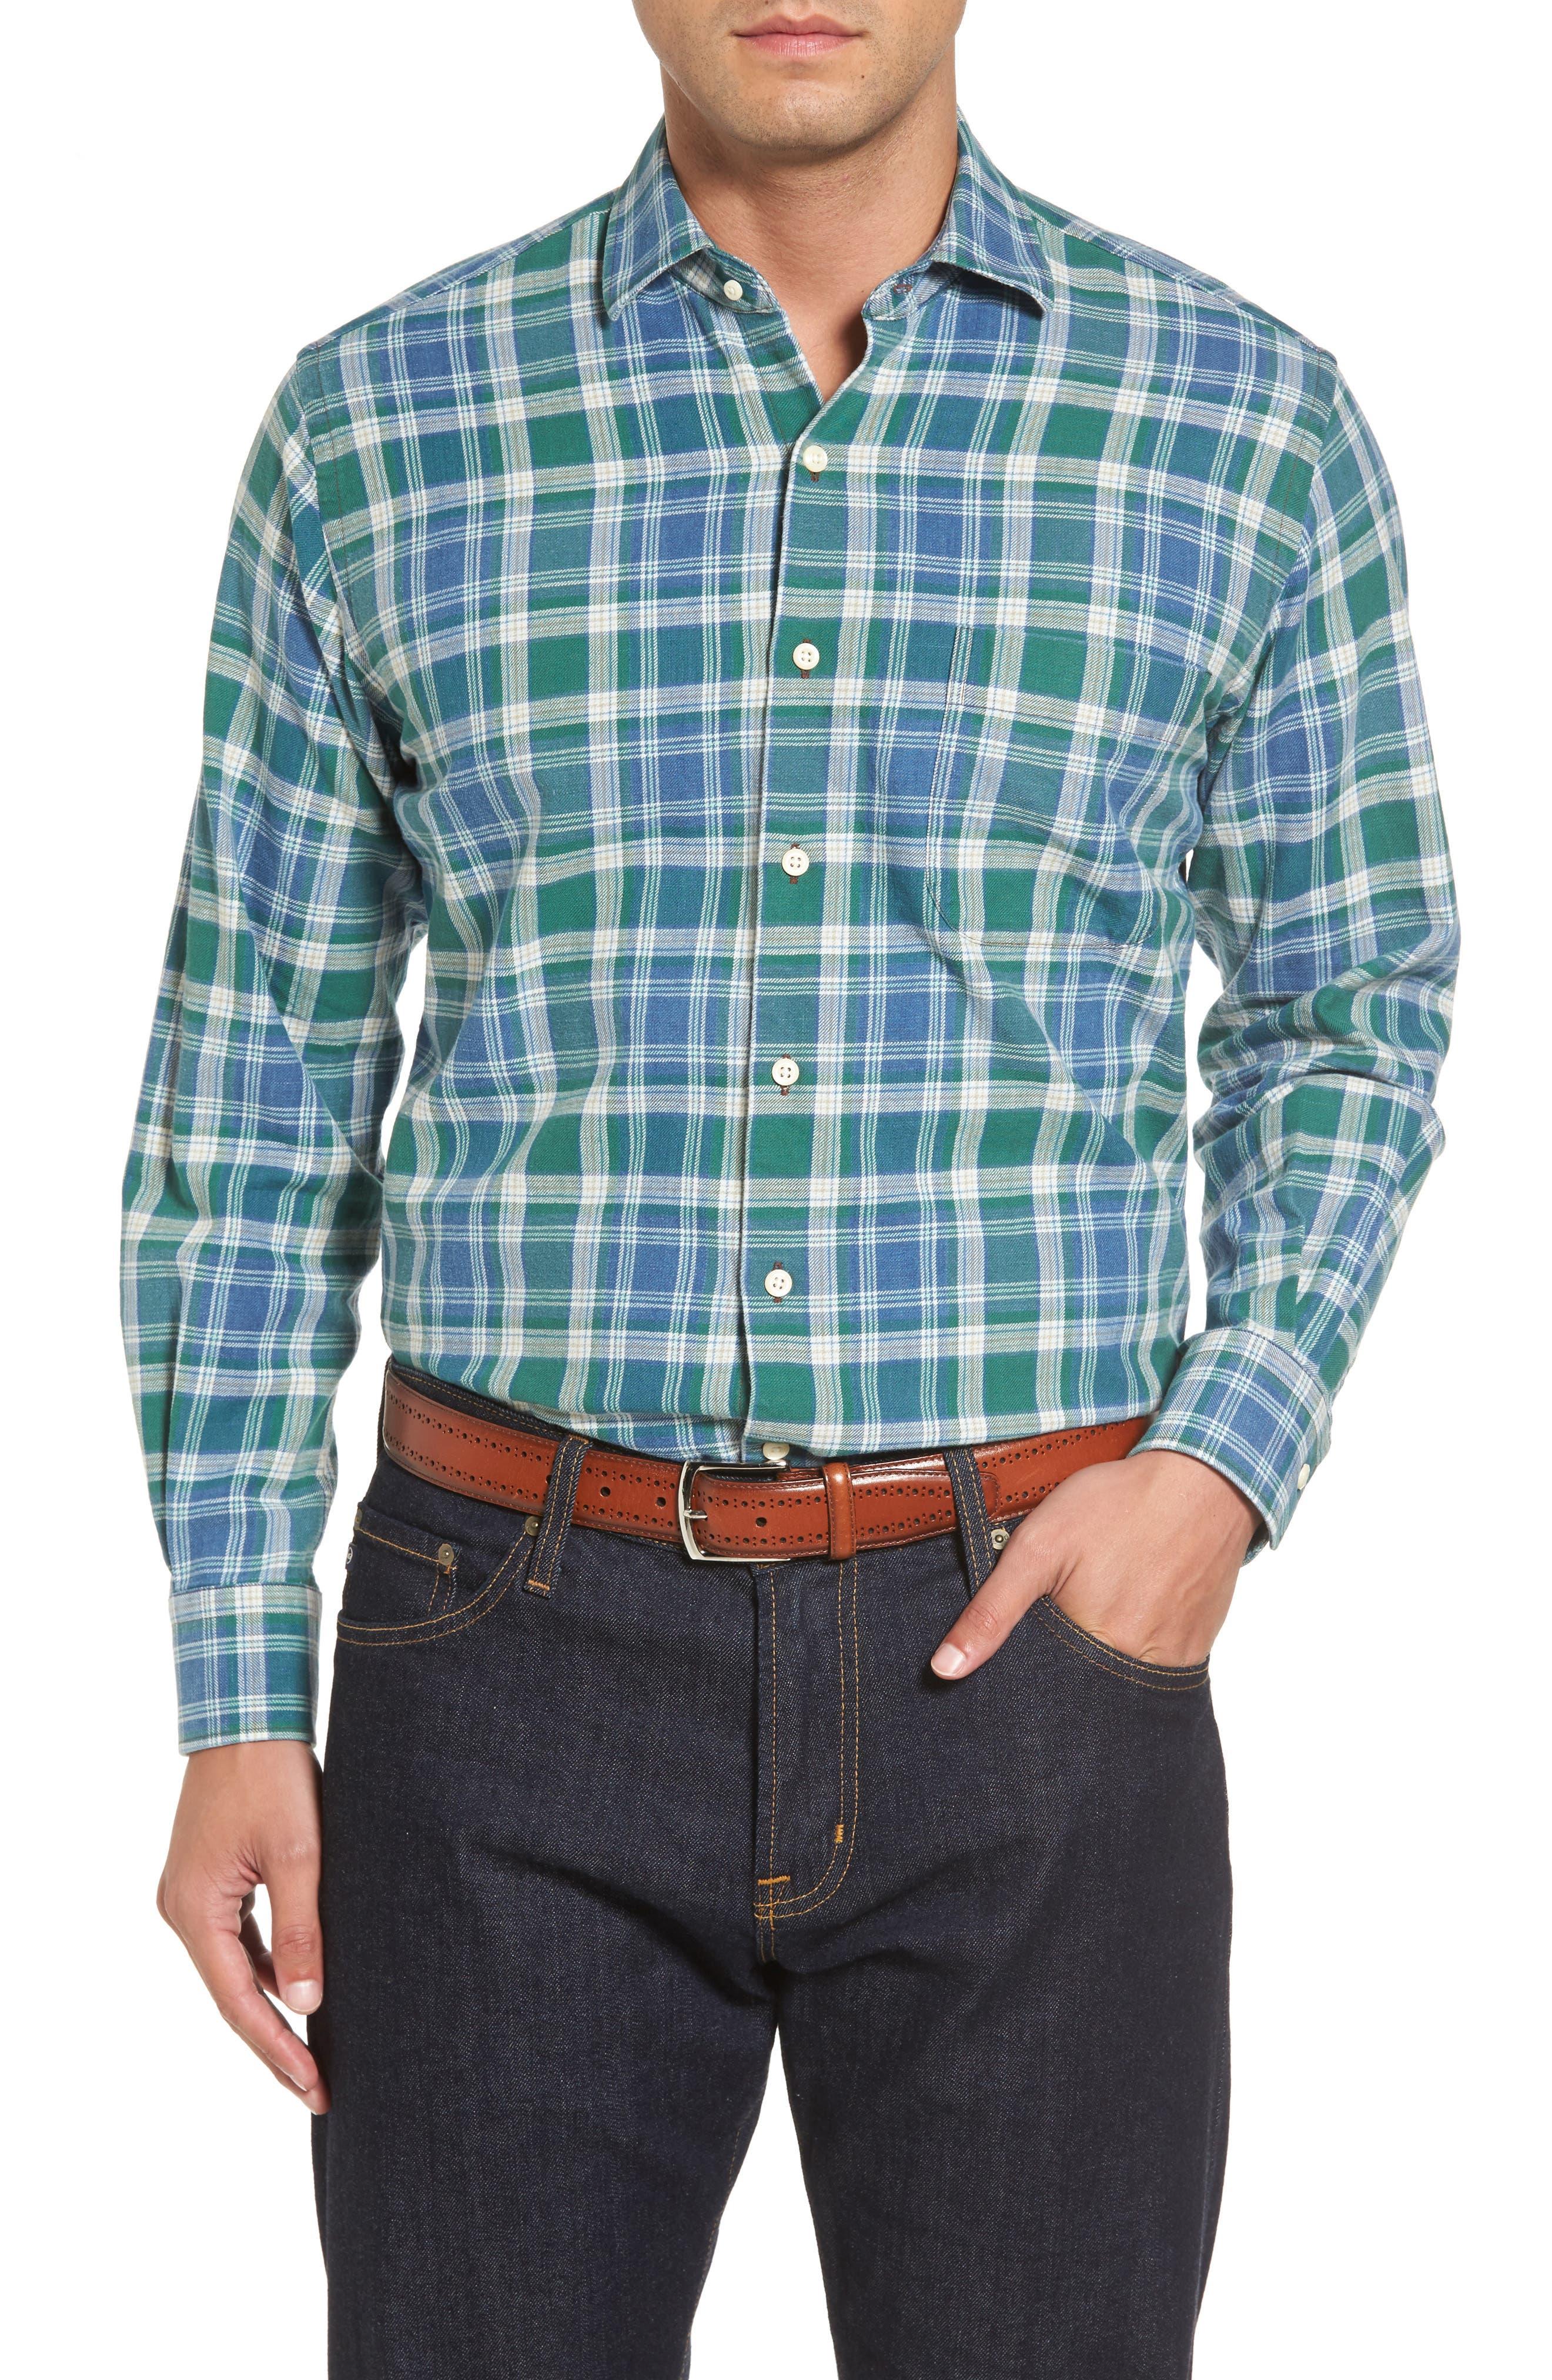 Main Image - Peter Millar Rocky Regular Fit Plaid Sport Shirt